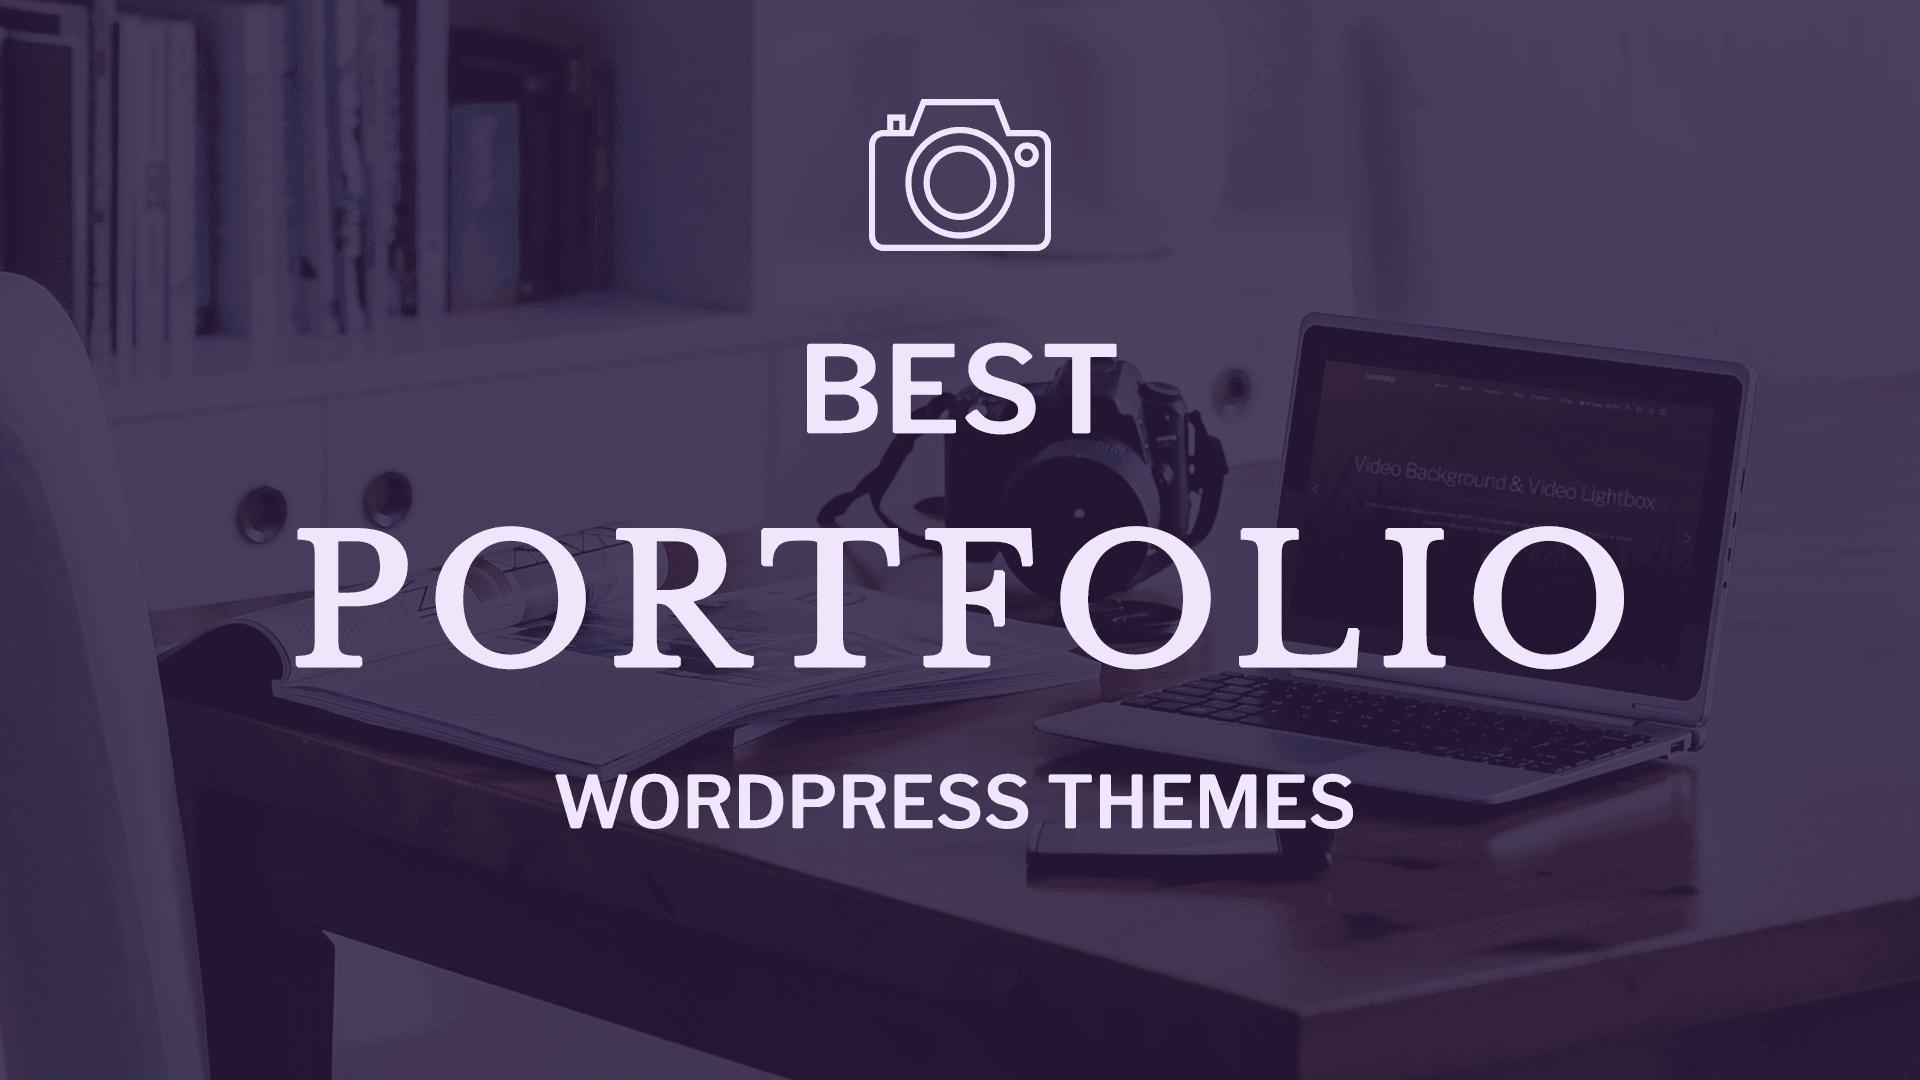 20+ Very Best Portfolio WordPress Themes for 2018